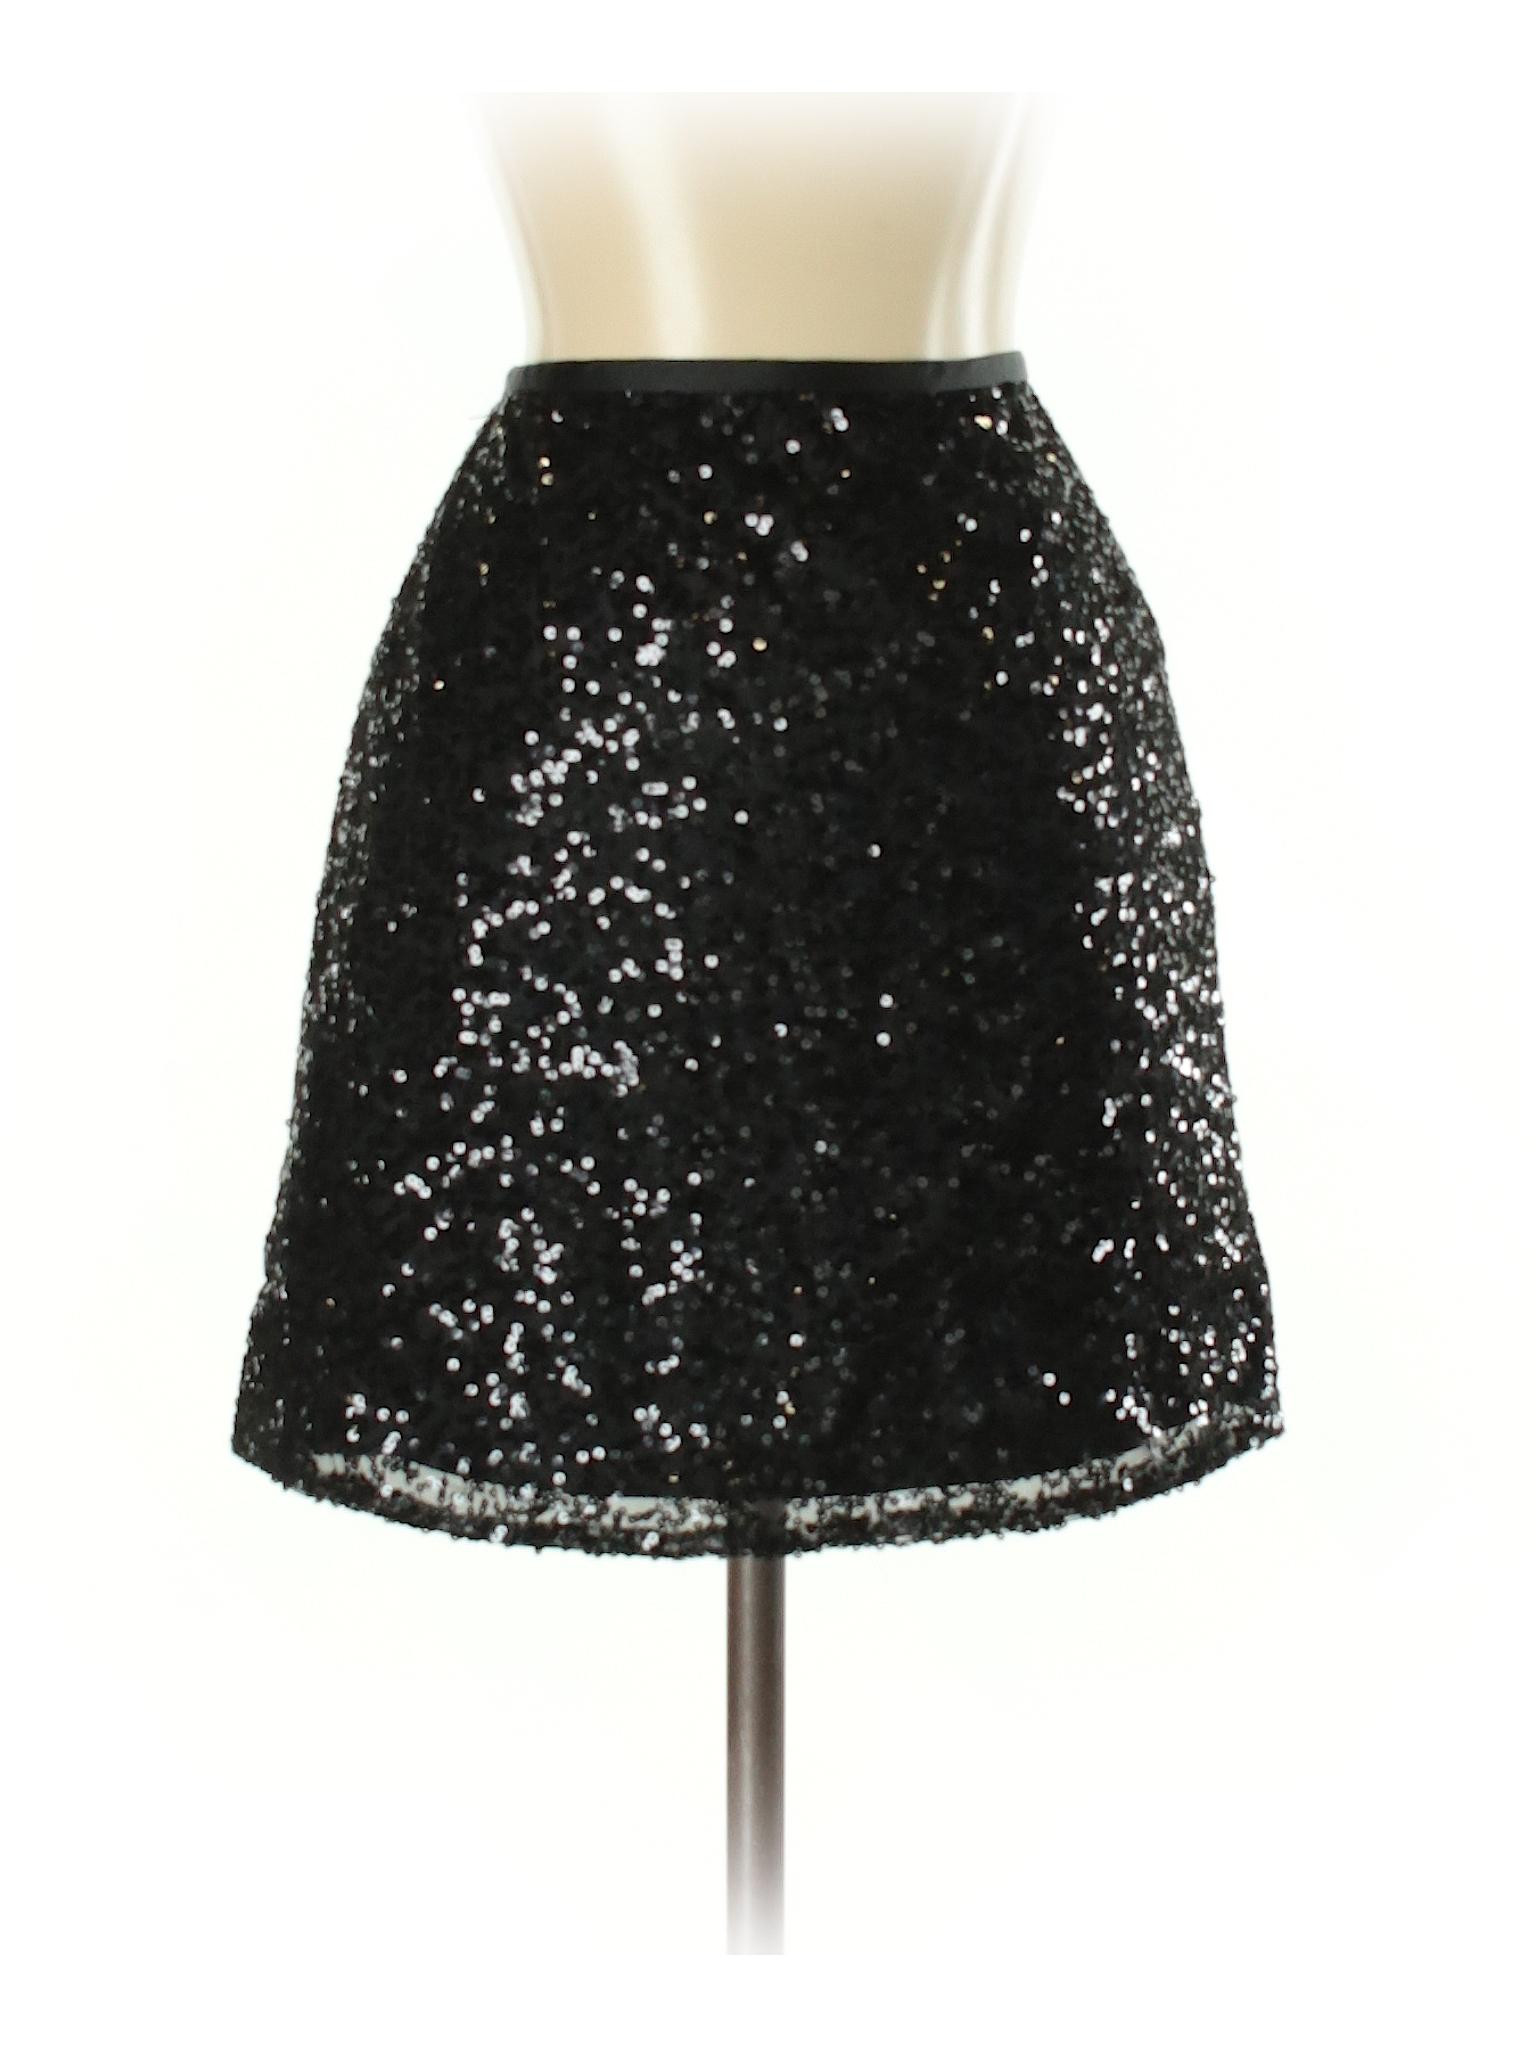 J Crew J Crew Boutique Skirt Formal Formal Skirt Boutique Boutique Tqnw56fRq